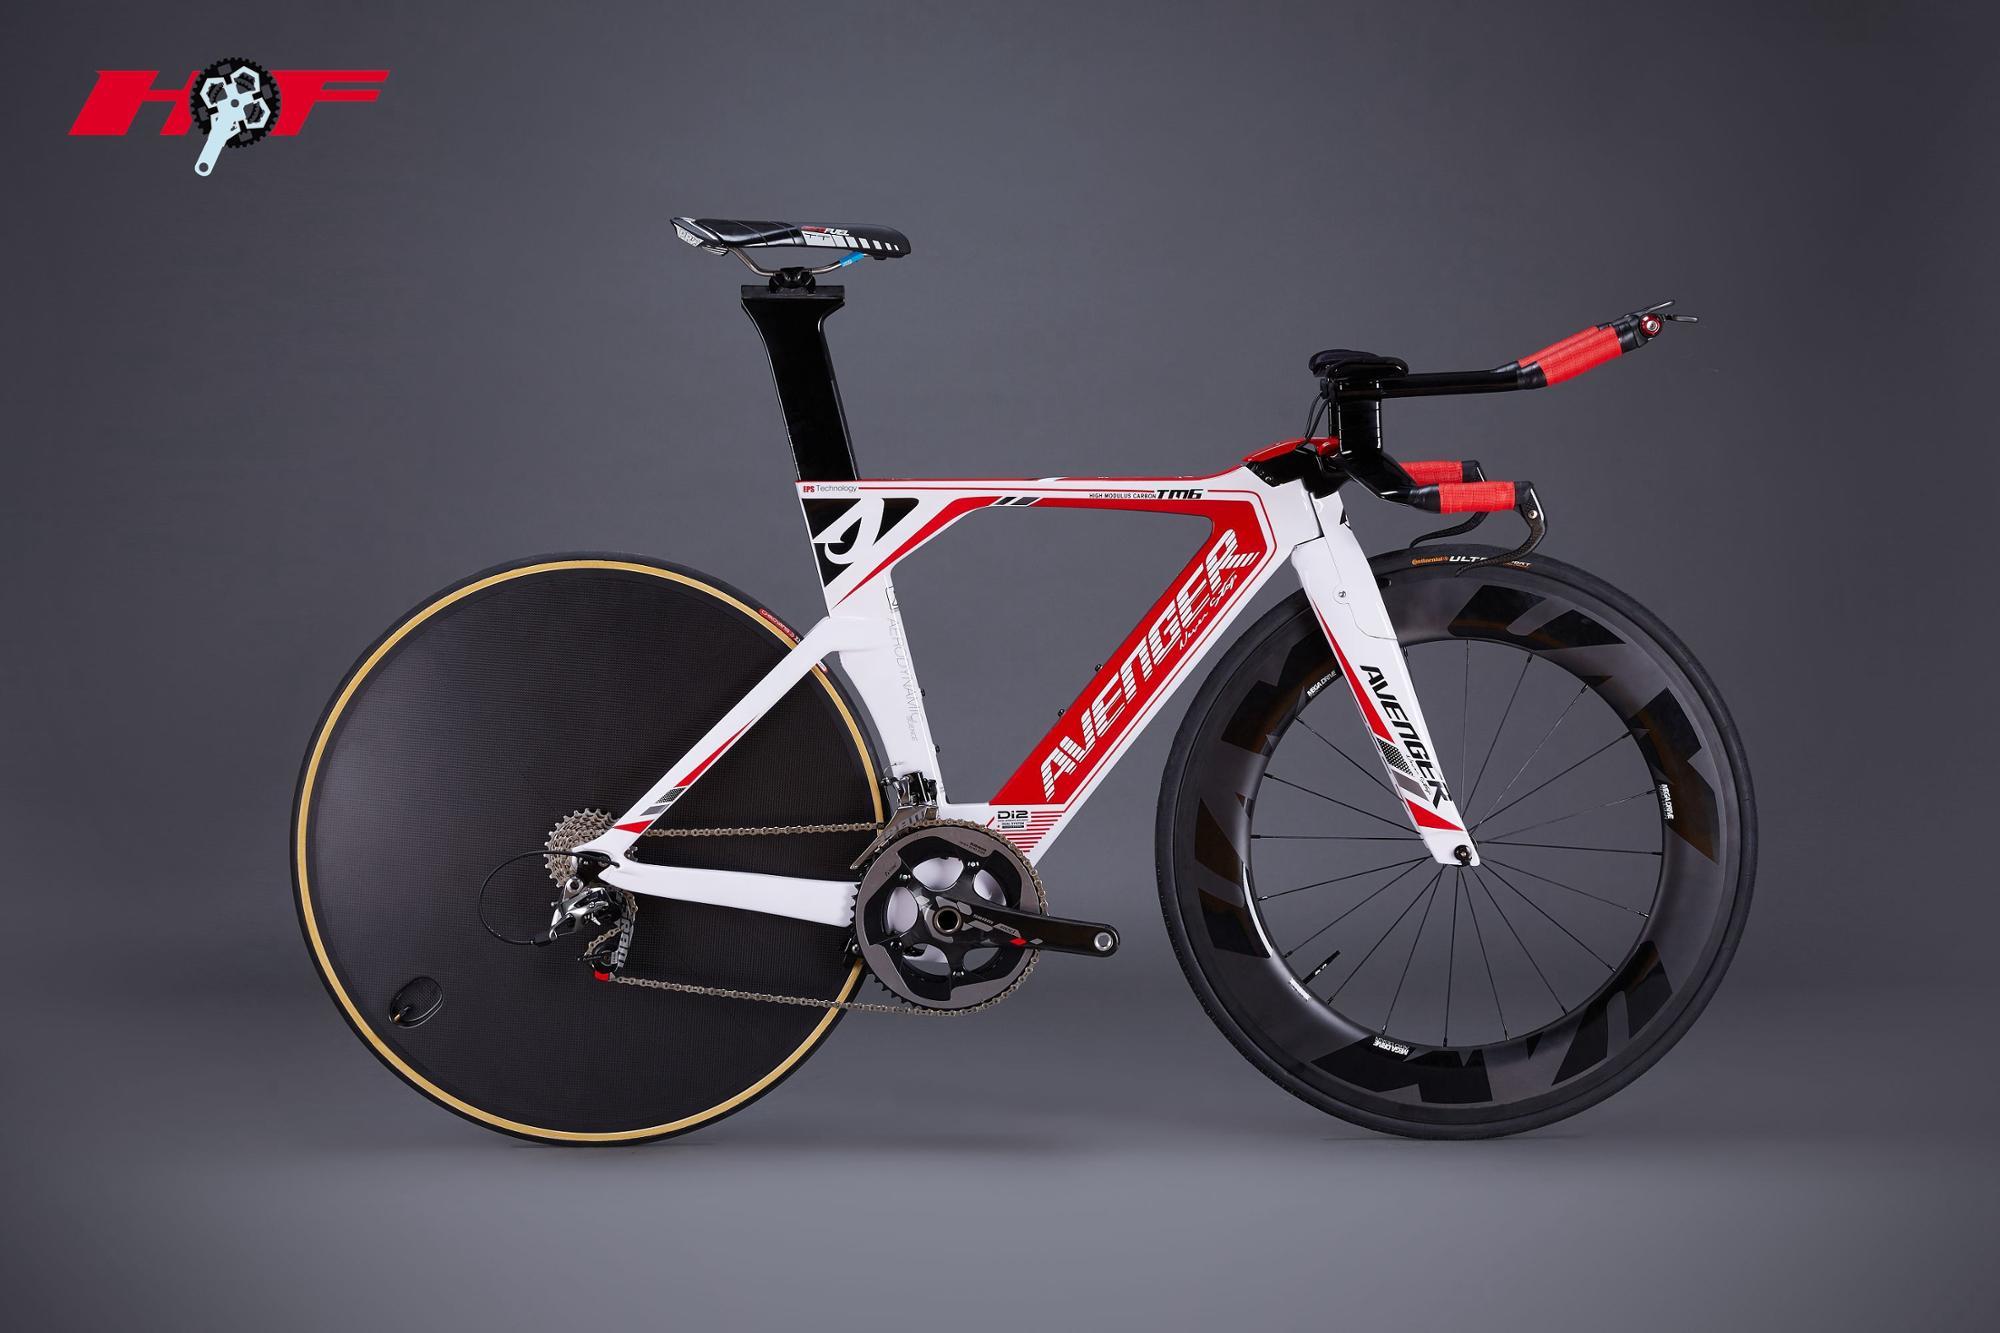 2015 HongFu designed hidden cable TT frame,carbon bicycle frame,New Time Trial carbon bike frame TM6